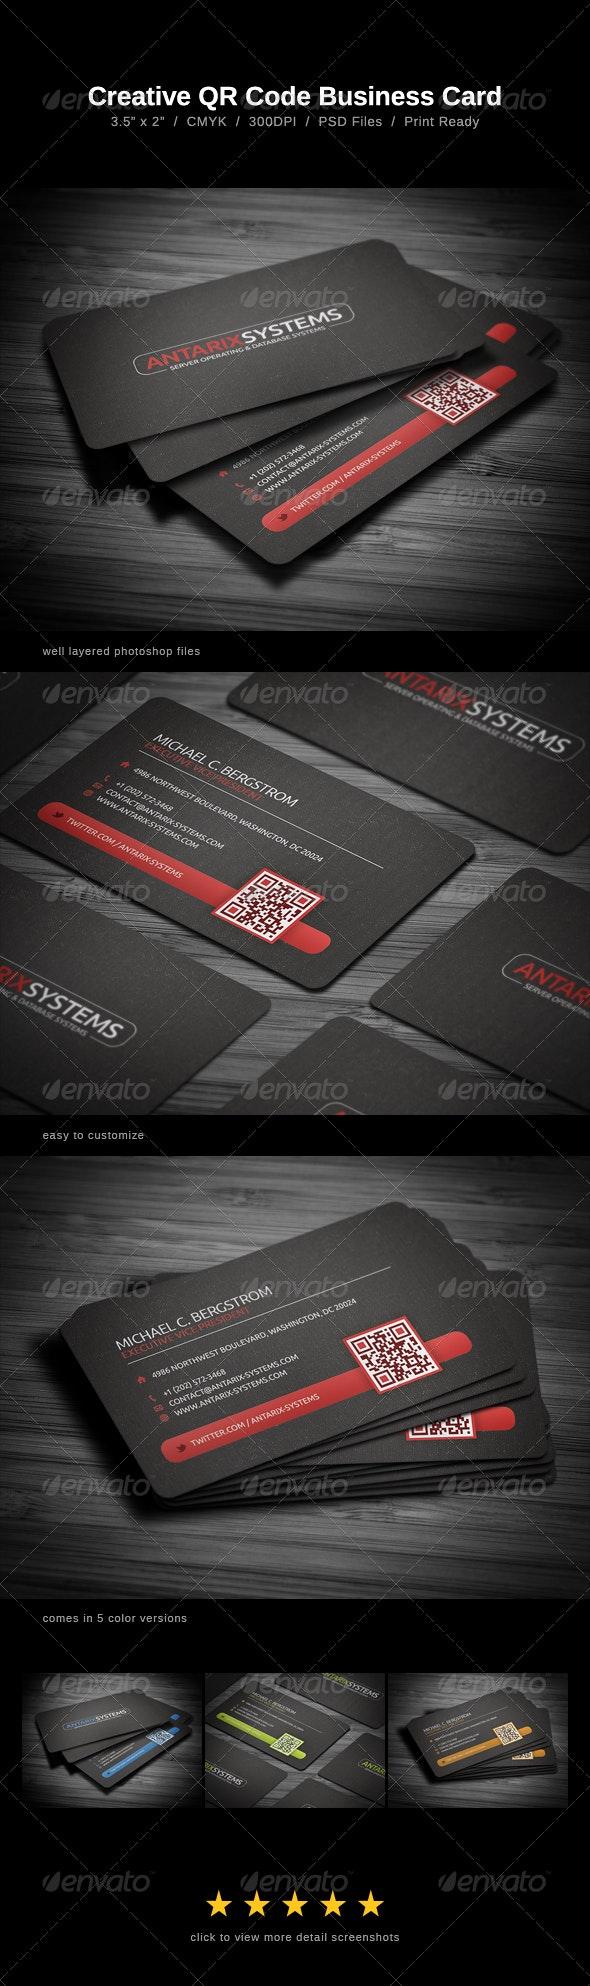 Creative QR Code Business Card - Business Cards Print Templates